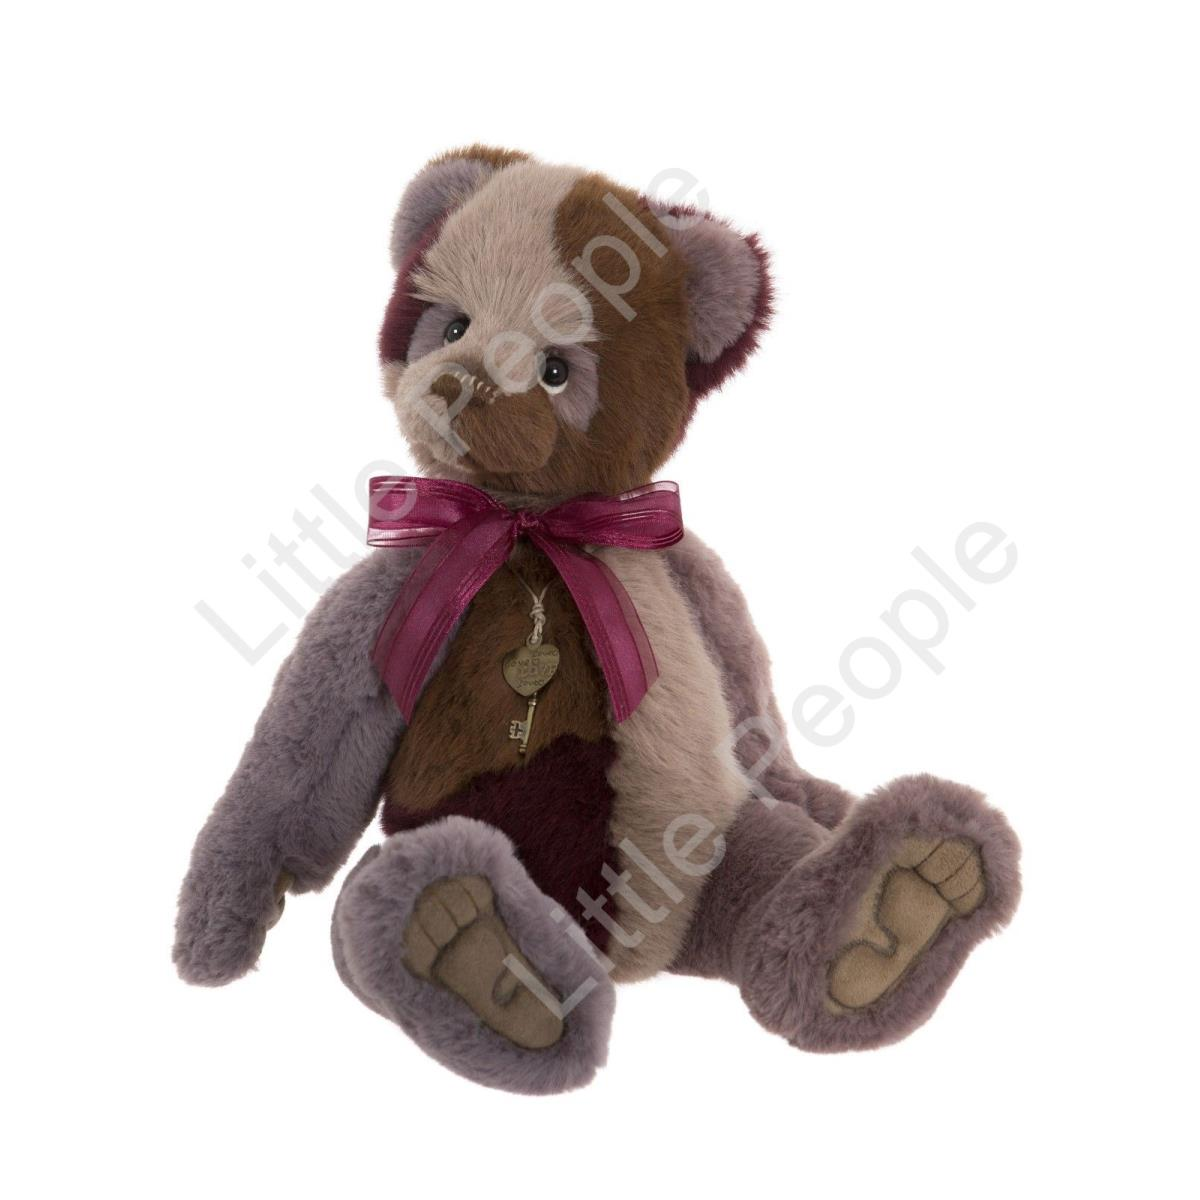 Bears 100% Quality Chutney ~ Stunning Plush Bear By Charlie Bears ~ Adorable!!